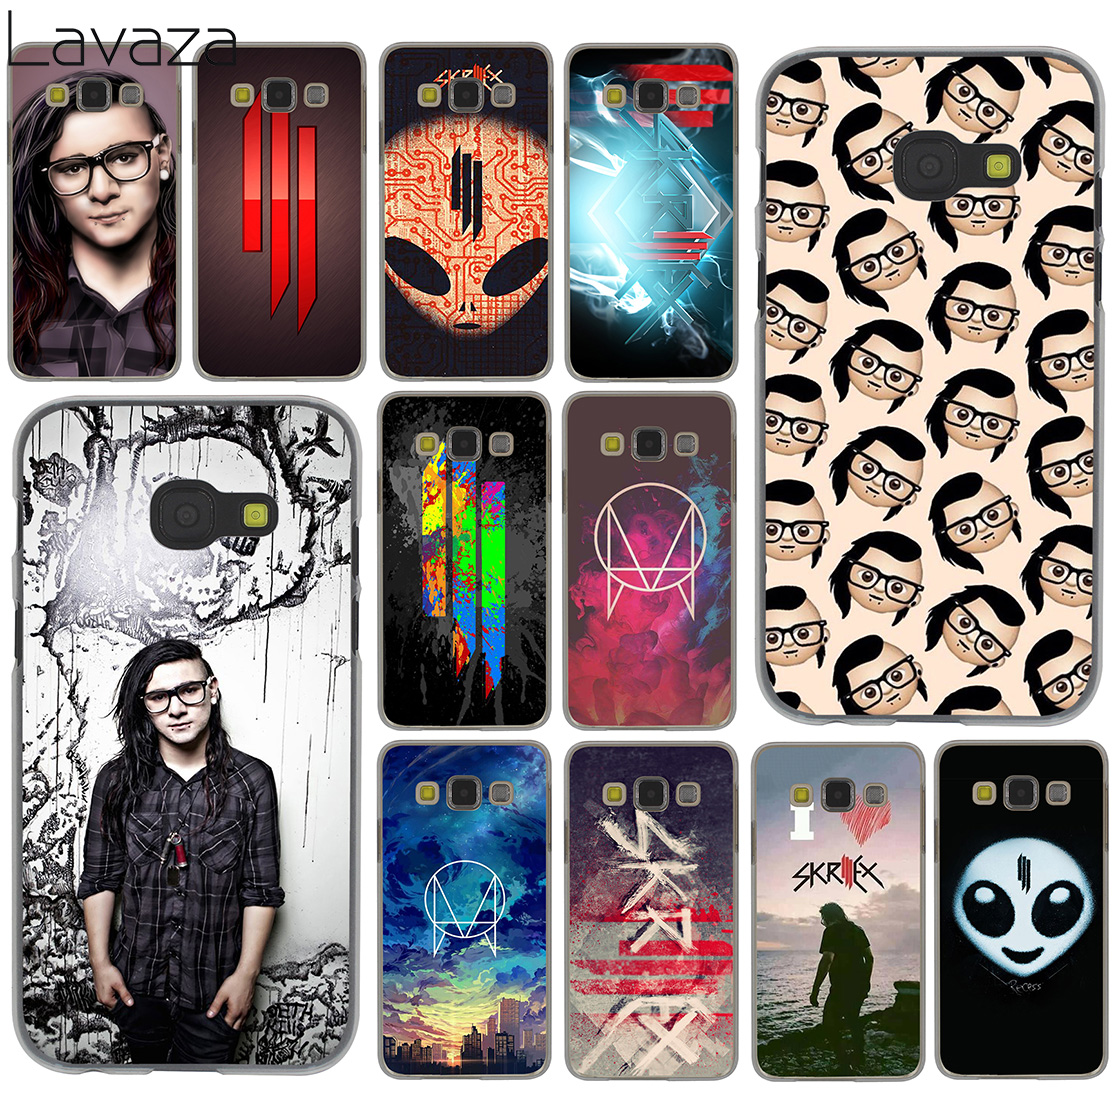 Lavaza skrillex Music dj Hard Case for Samsung Galaxy A3 A5 A7 A8 2015 2016 2017 2018 Note 8 5 4 3 2 Grand Prime